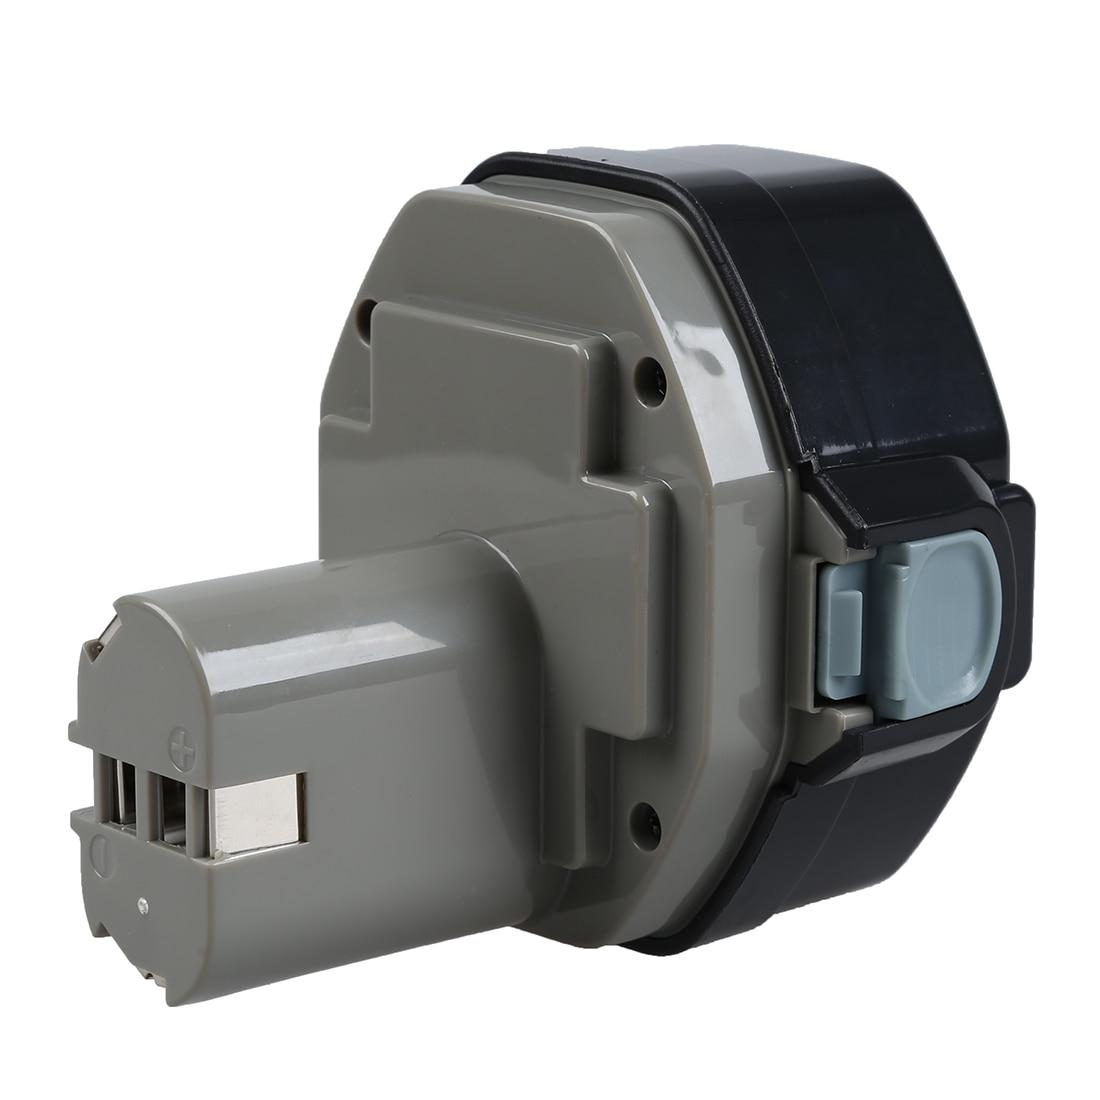 все цены на 14.4 V Battery For MAKITA 1433 1434 Makita 6233D 4033D 6333D 6336D 6337D 8433D, black+gray онлайн